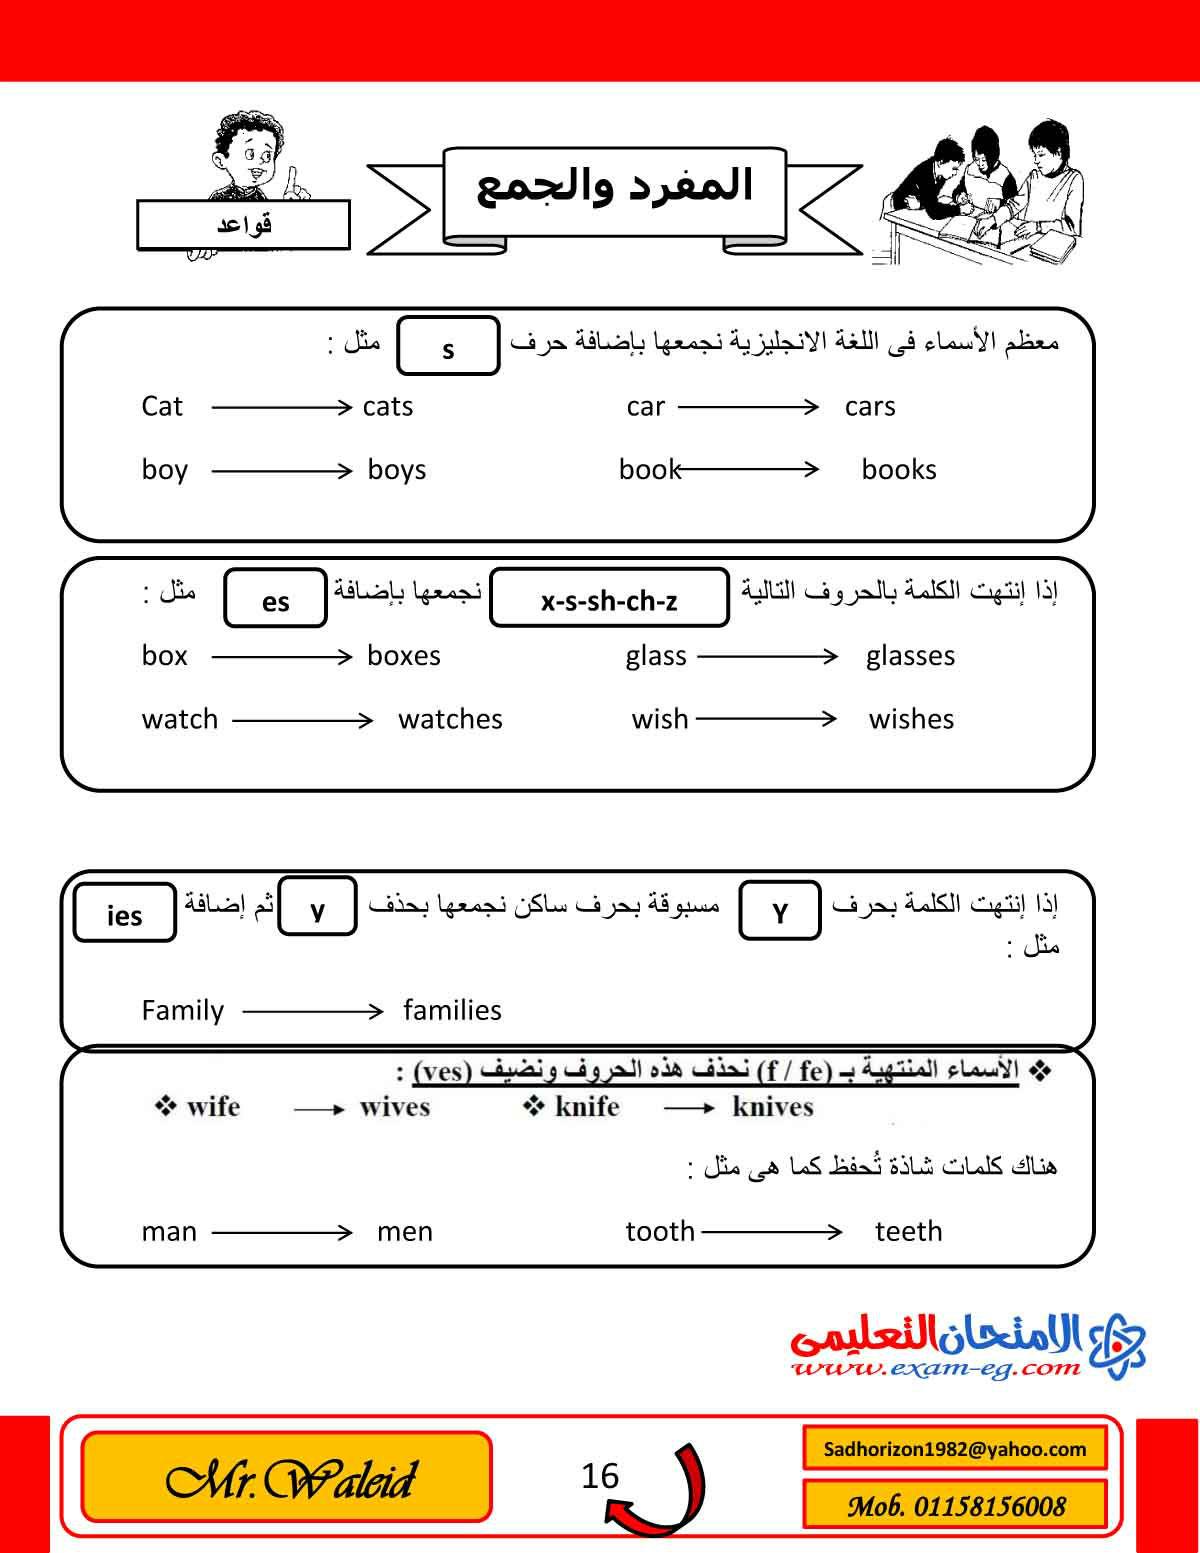 exam-eg.com_1449405243816.jpg